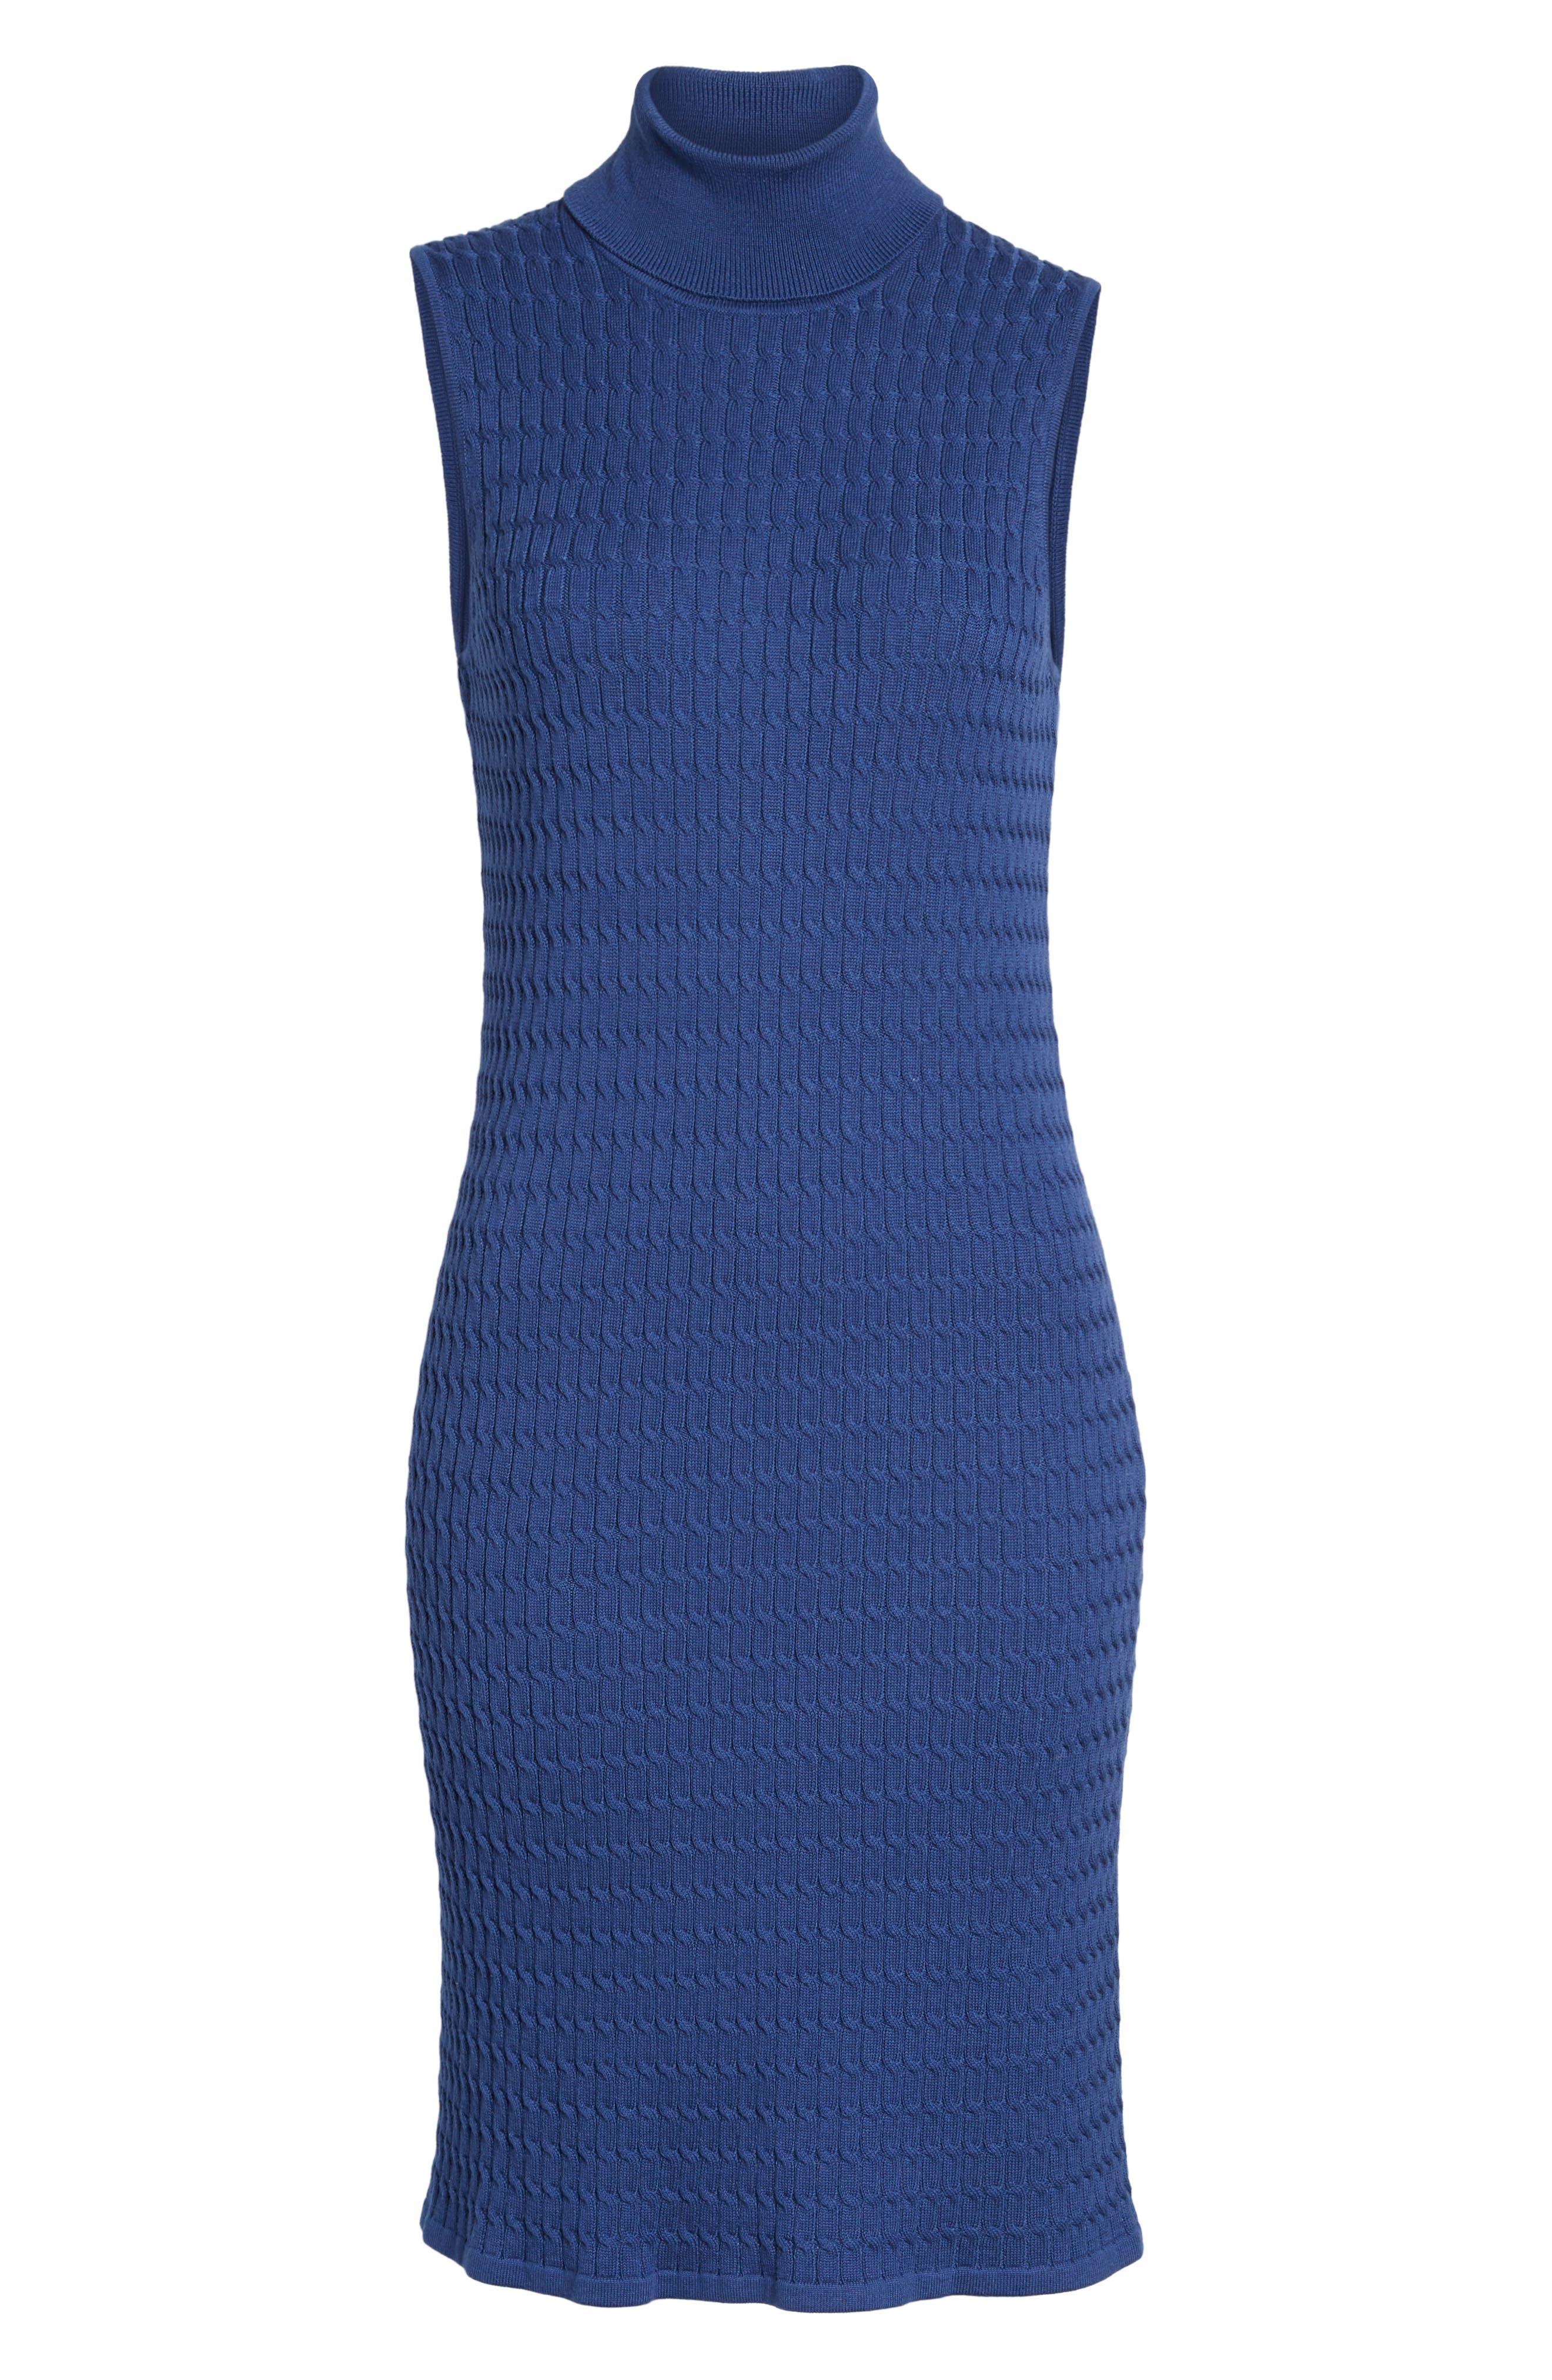 Sleeveless Turtleneck Dress,                             Alternate thumbnail 6, color,                             ECLIPSE